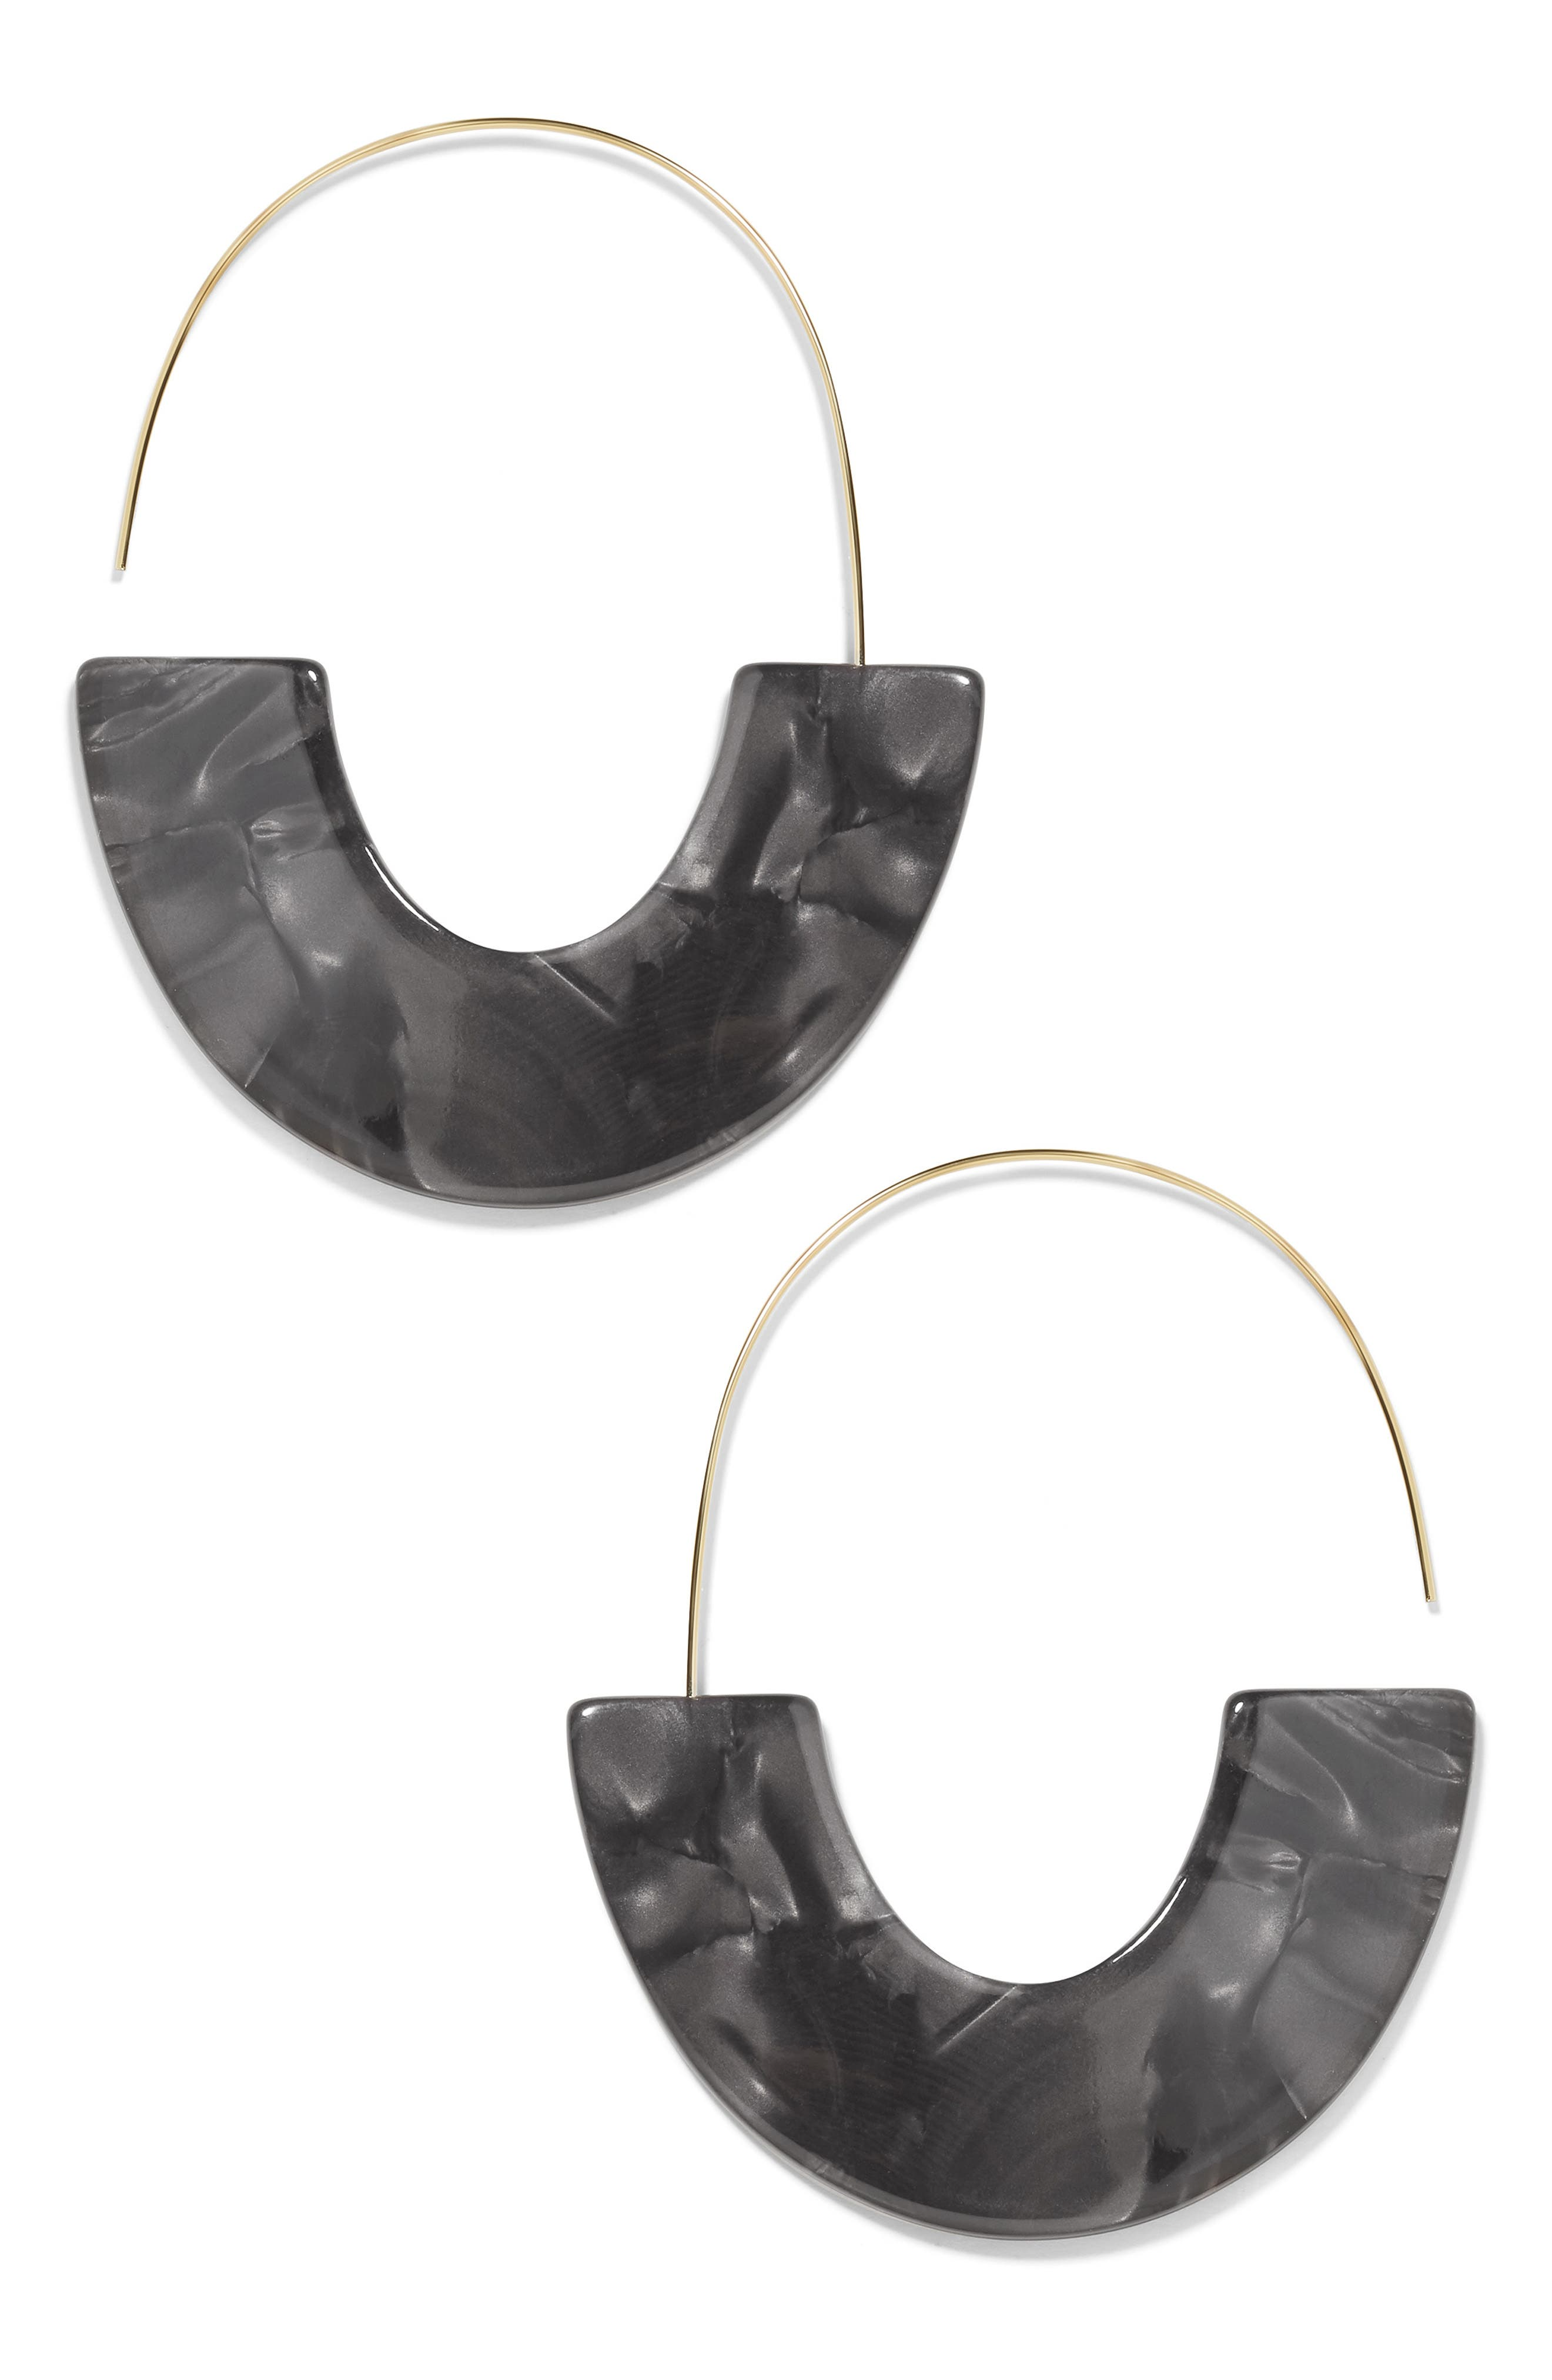 BAUBLEBAR, Faidra Thin Drop Acrylic Oval Hoop Earrings, Main thumbnail 1, color, BLACK